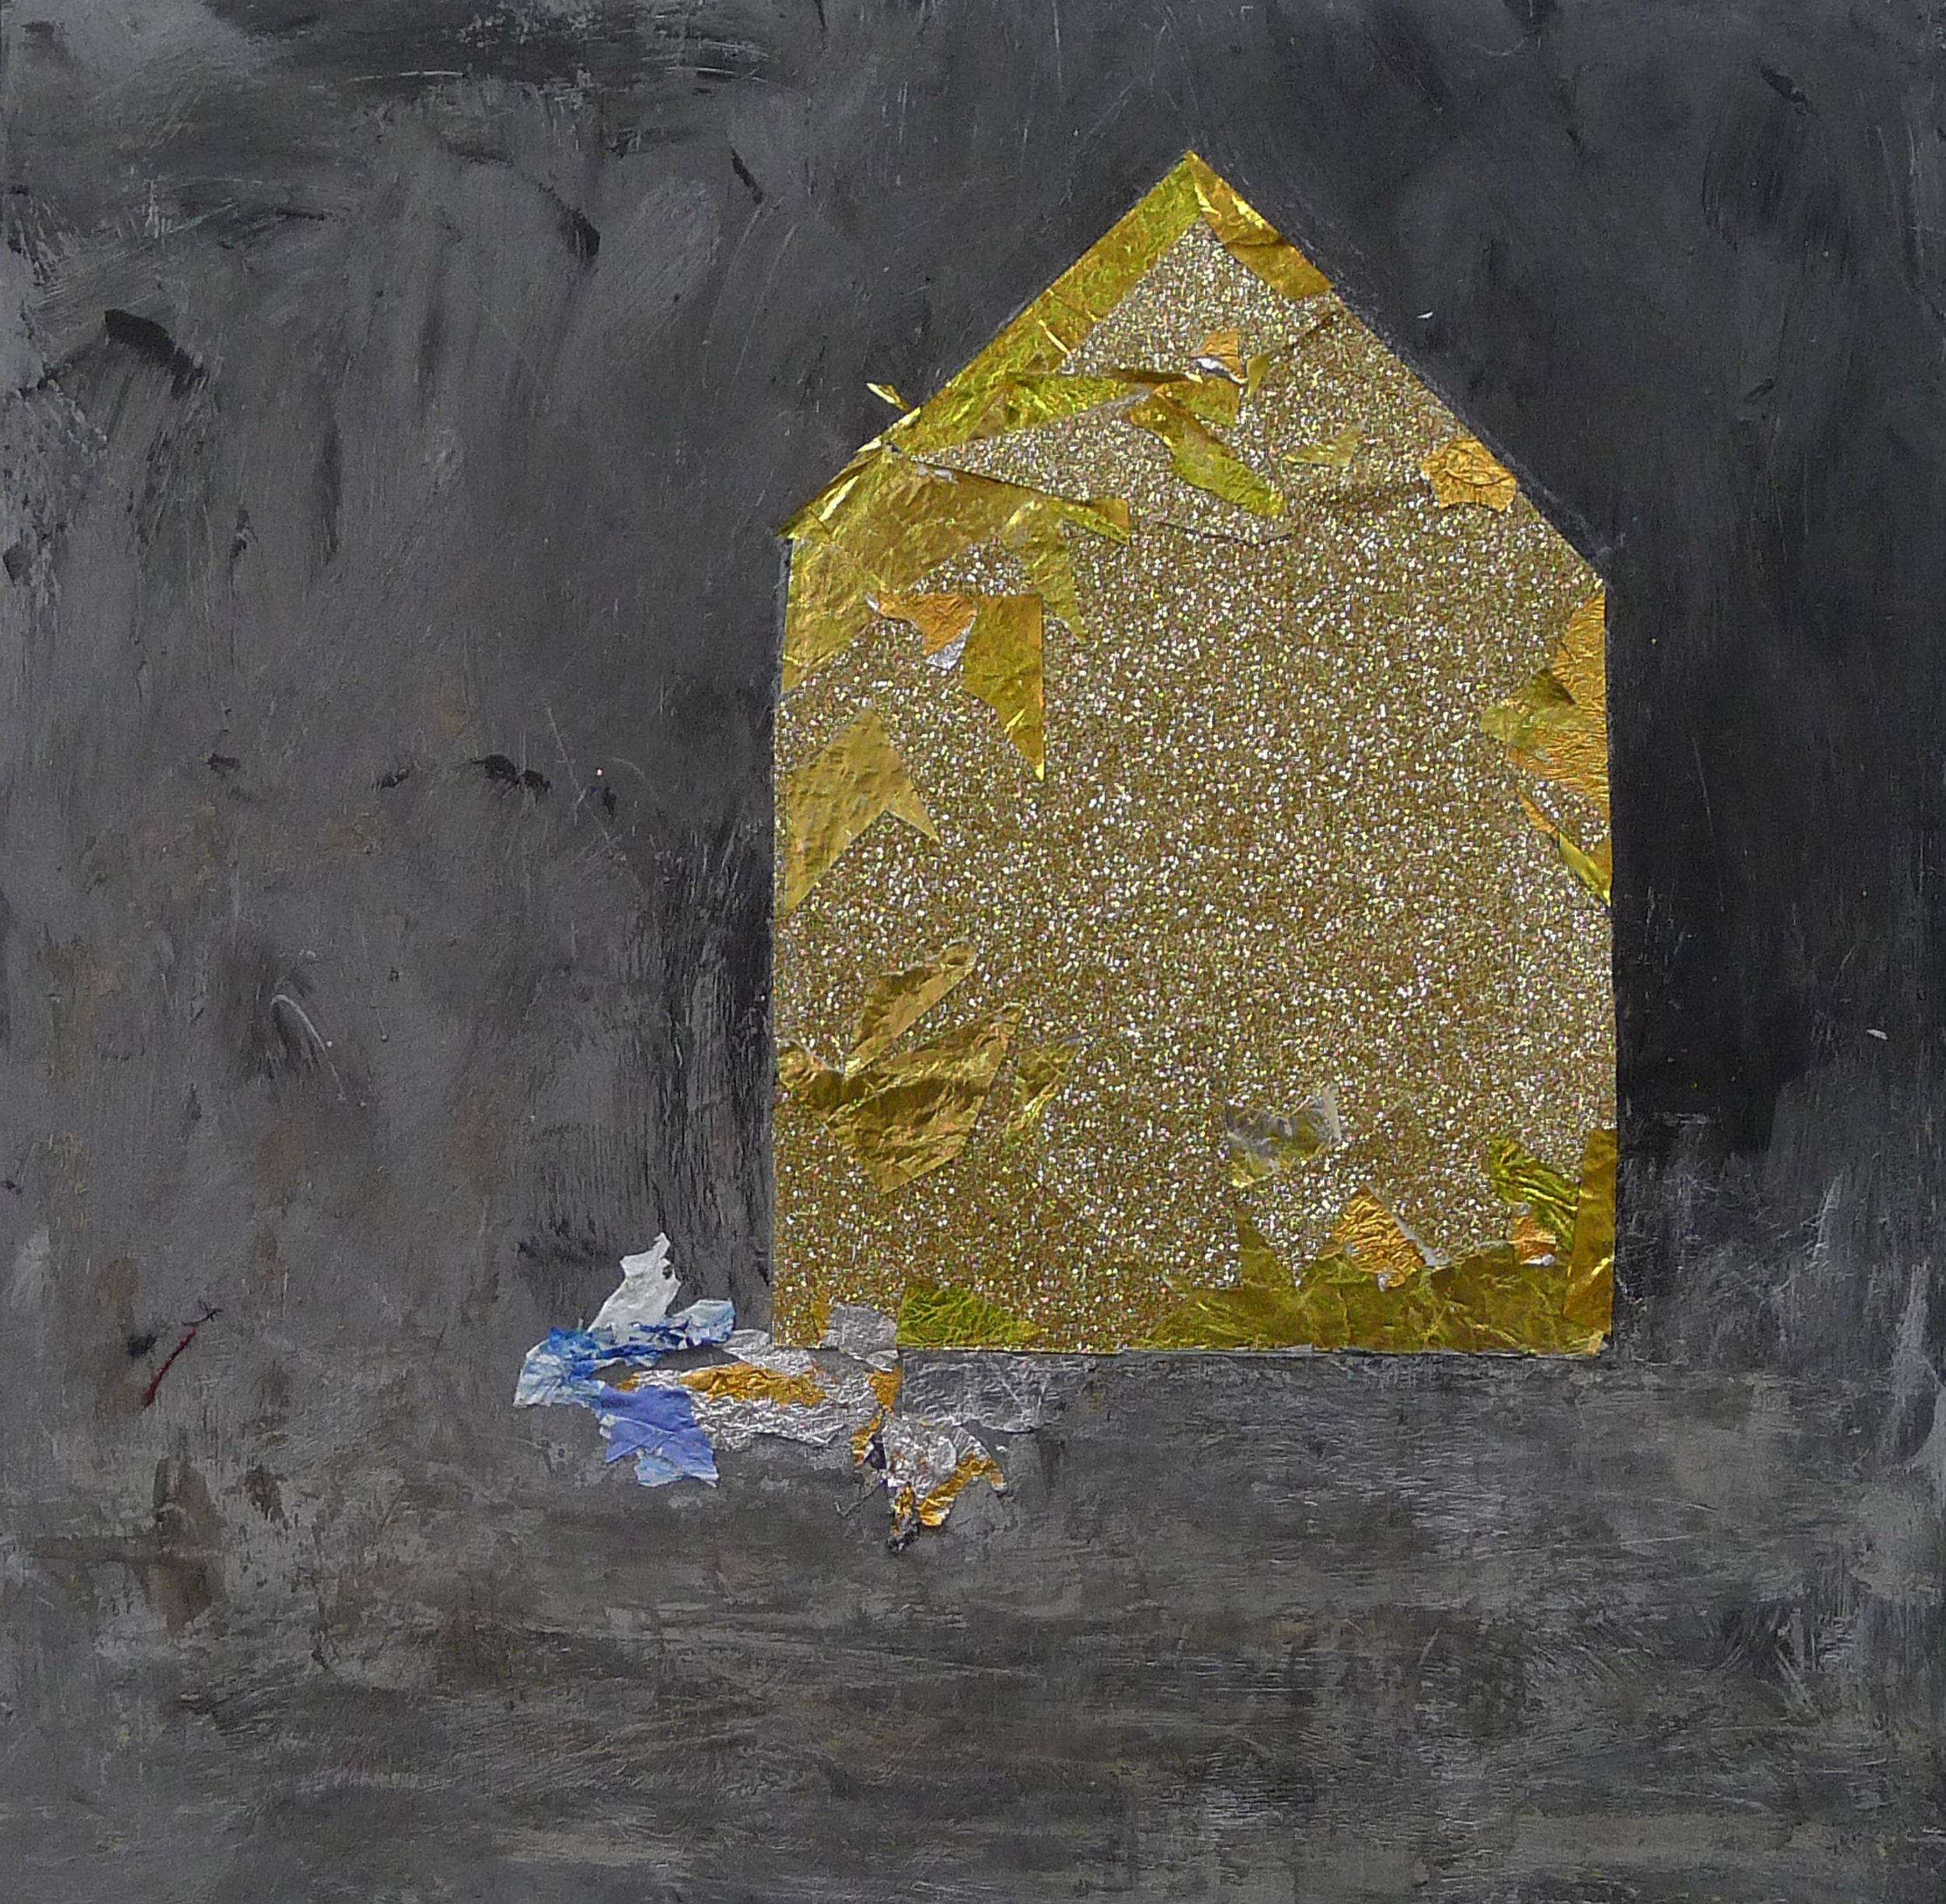 Brenda Cirioni,  Dream House: Night II , Mixed media, 8x8